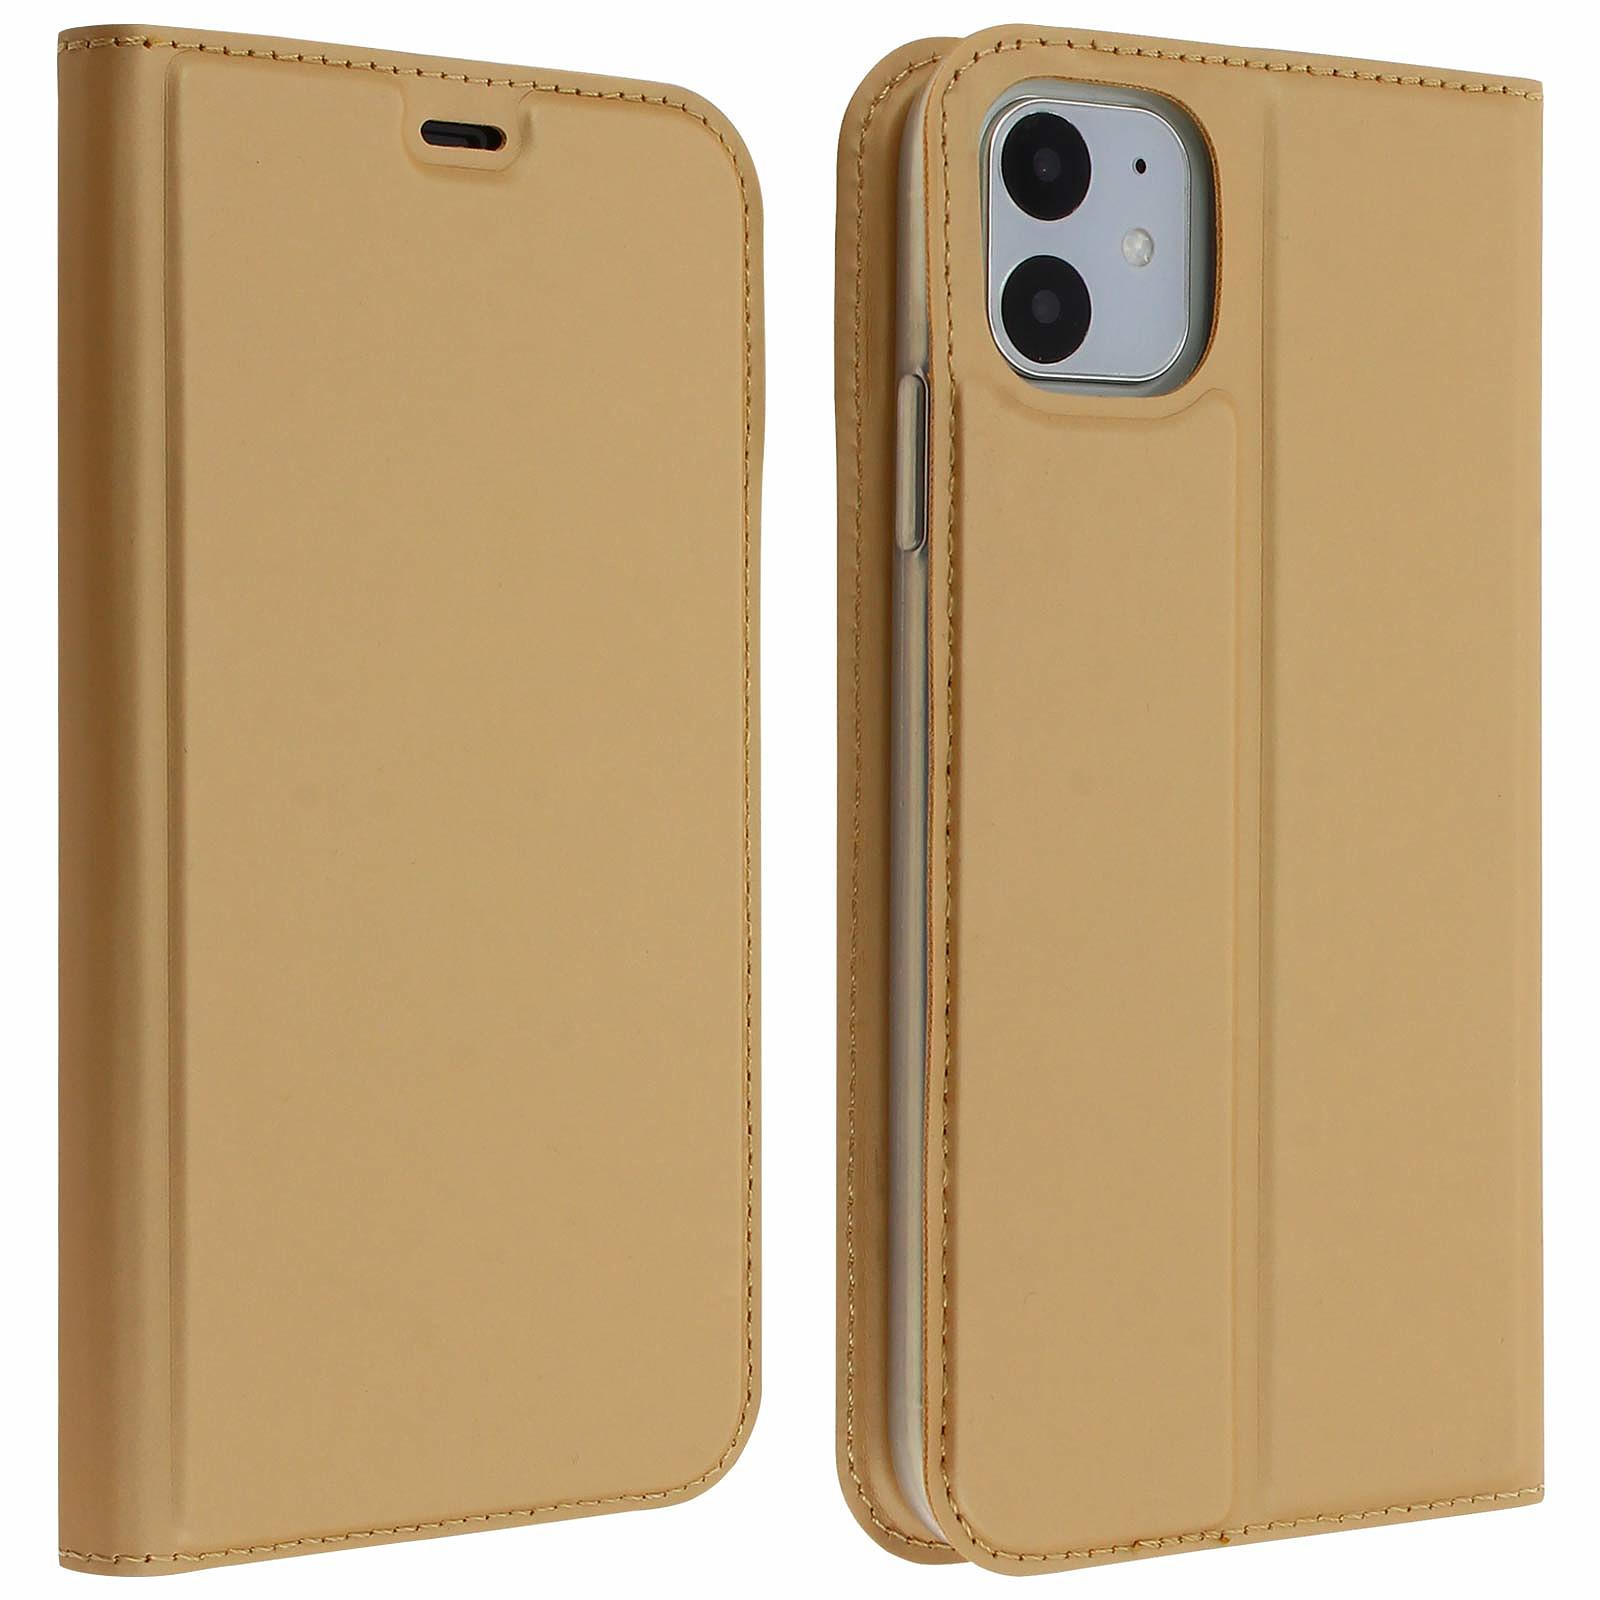 Avizar Etui folio Dorée Éco-cuir pour Apple iPhone 11